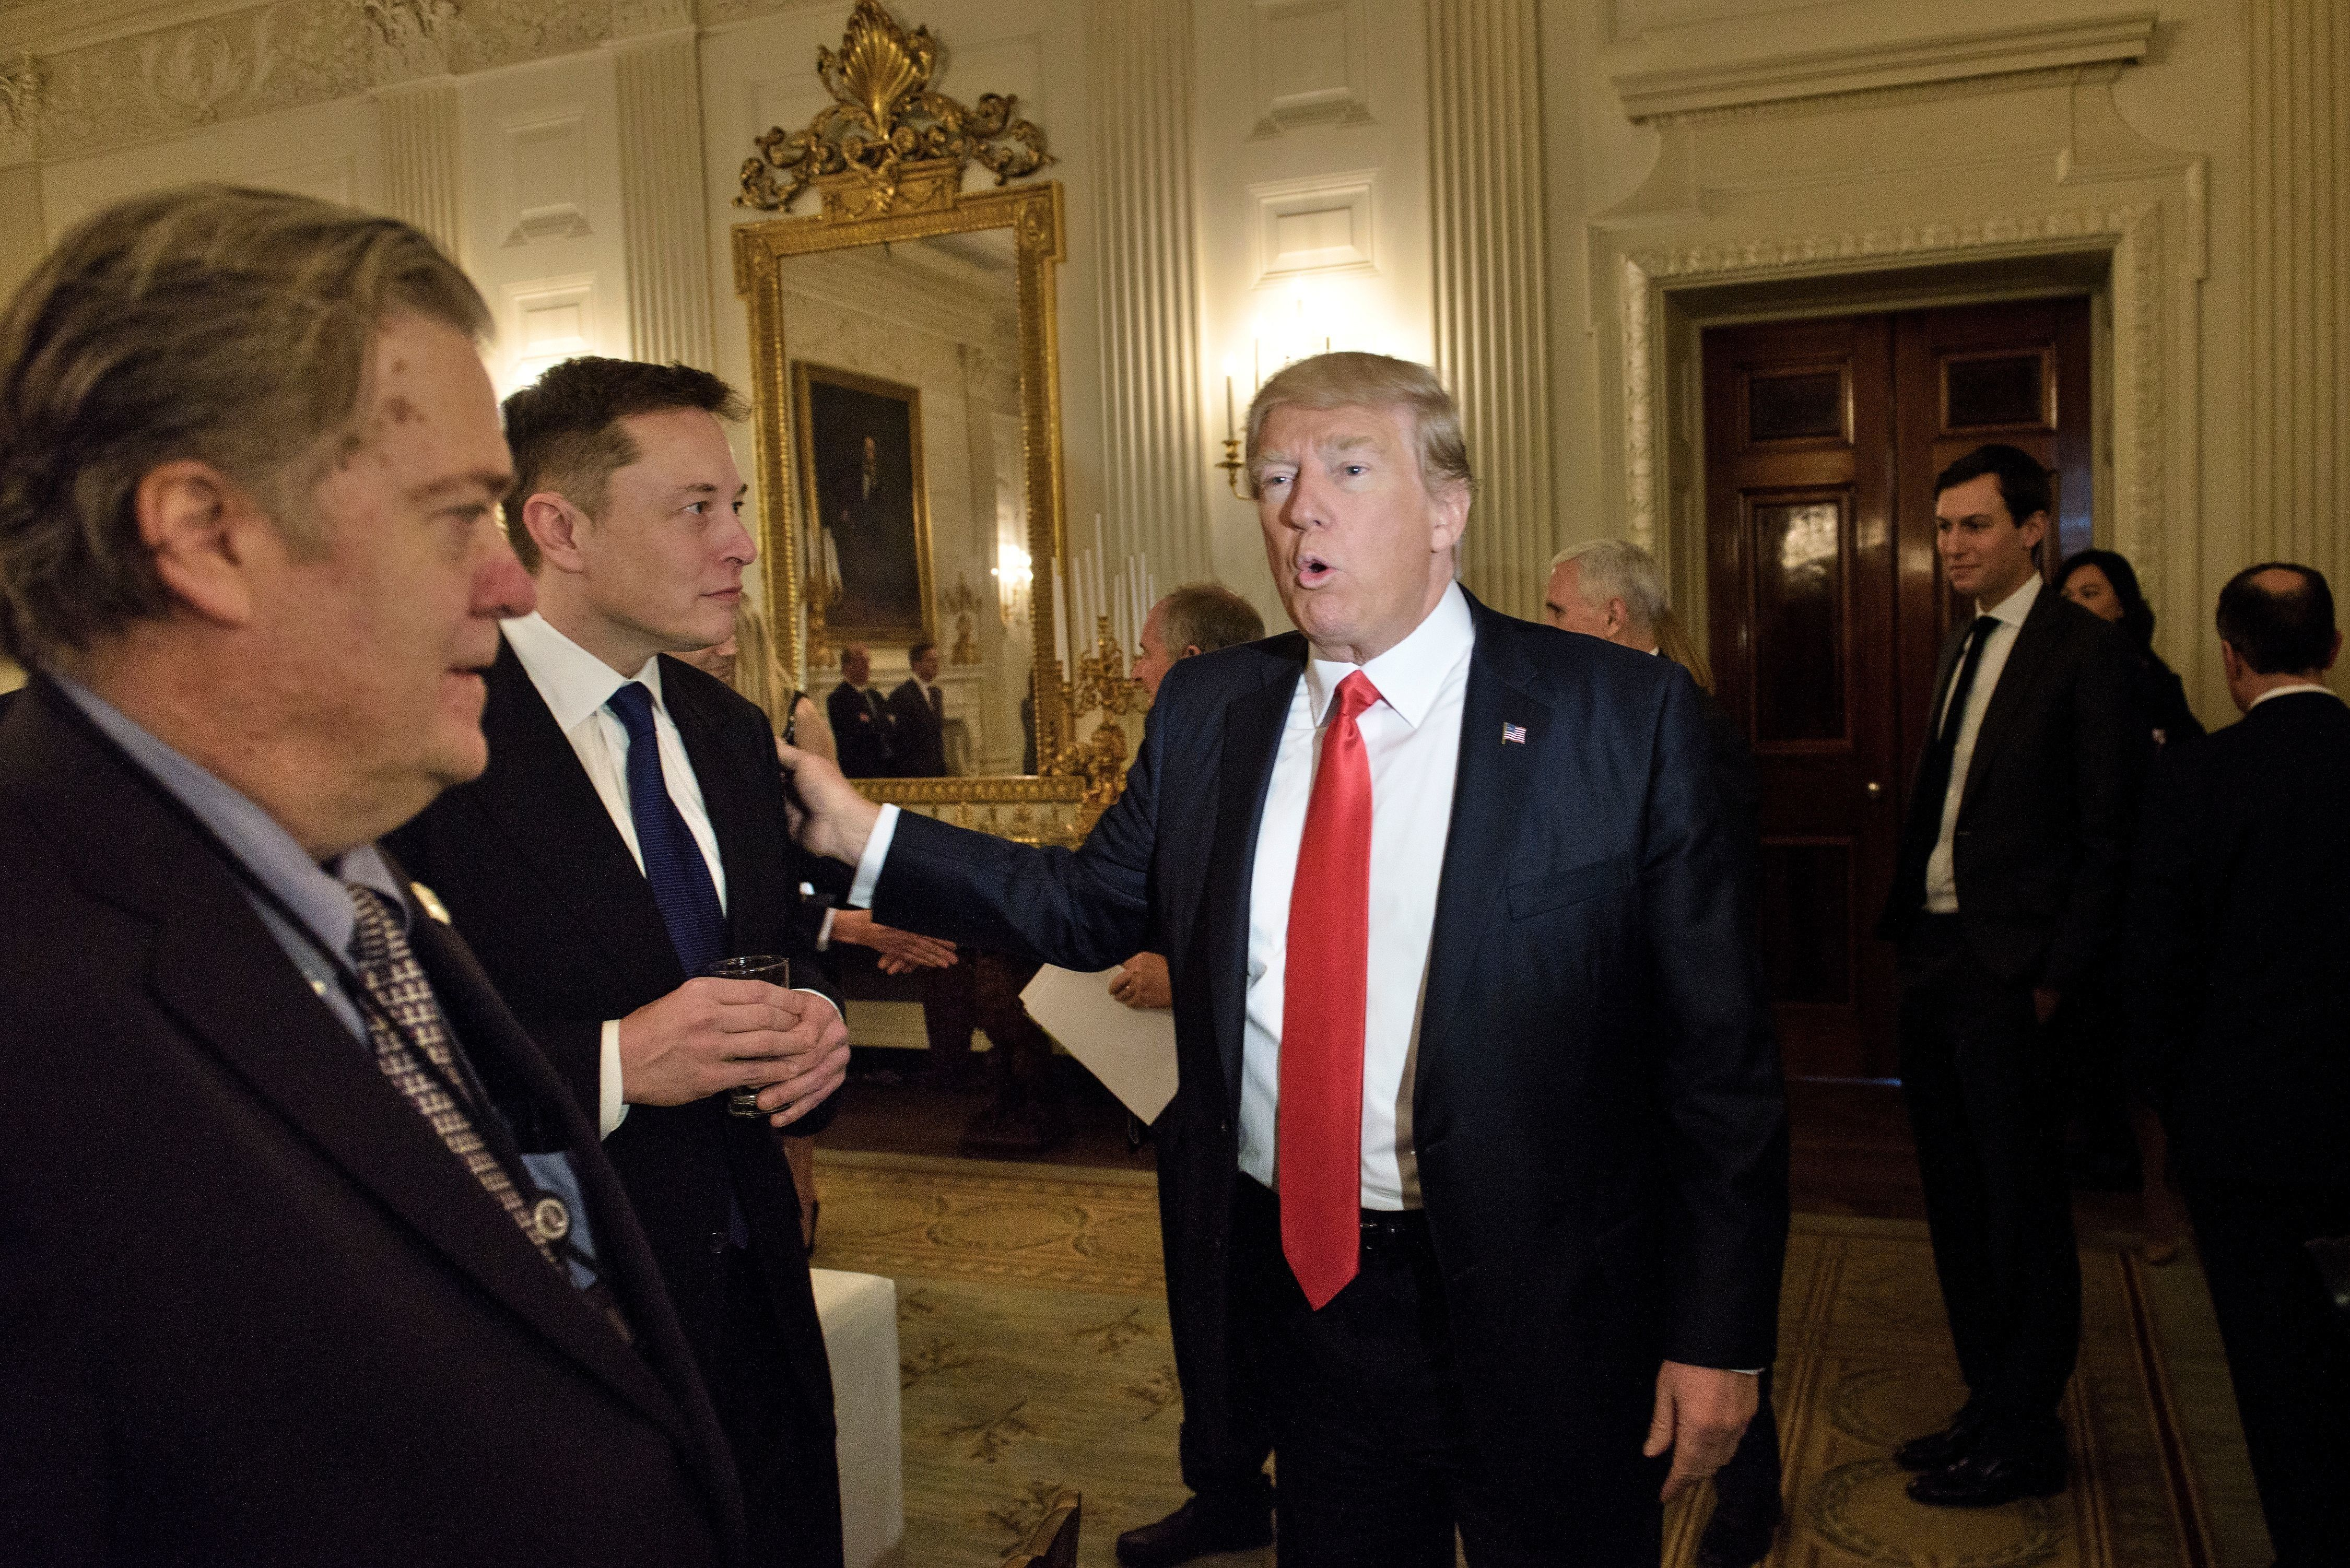 UPDATE: Elon Musk To Stop Advising Trump As U.S. Departs Paris Climate